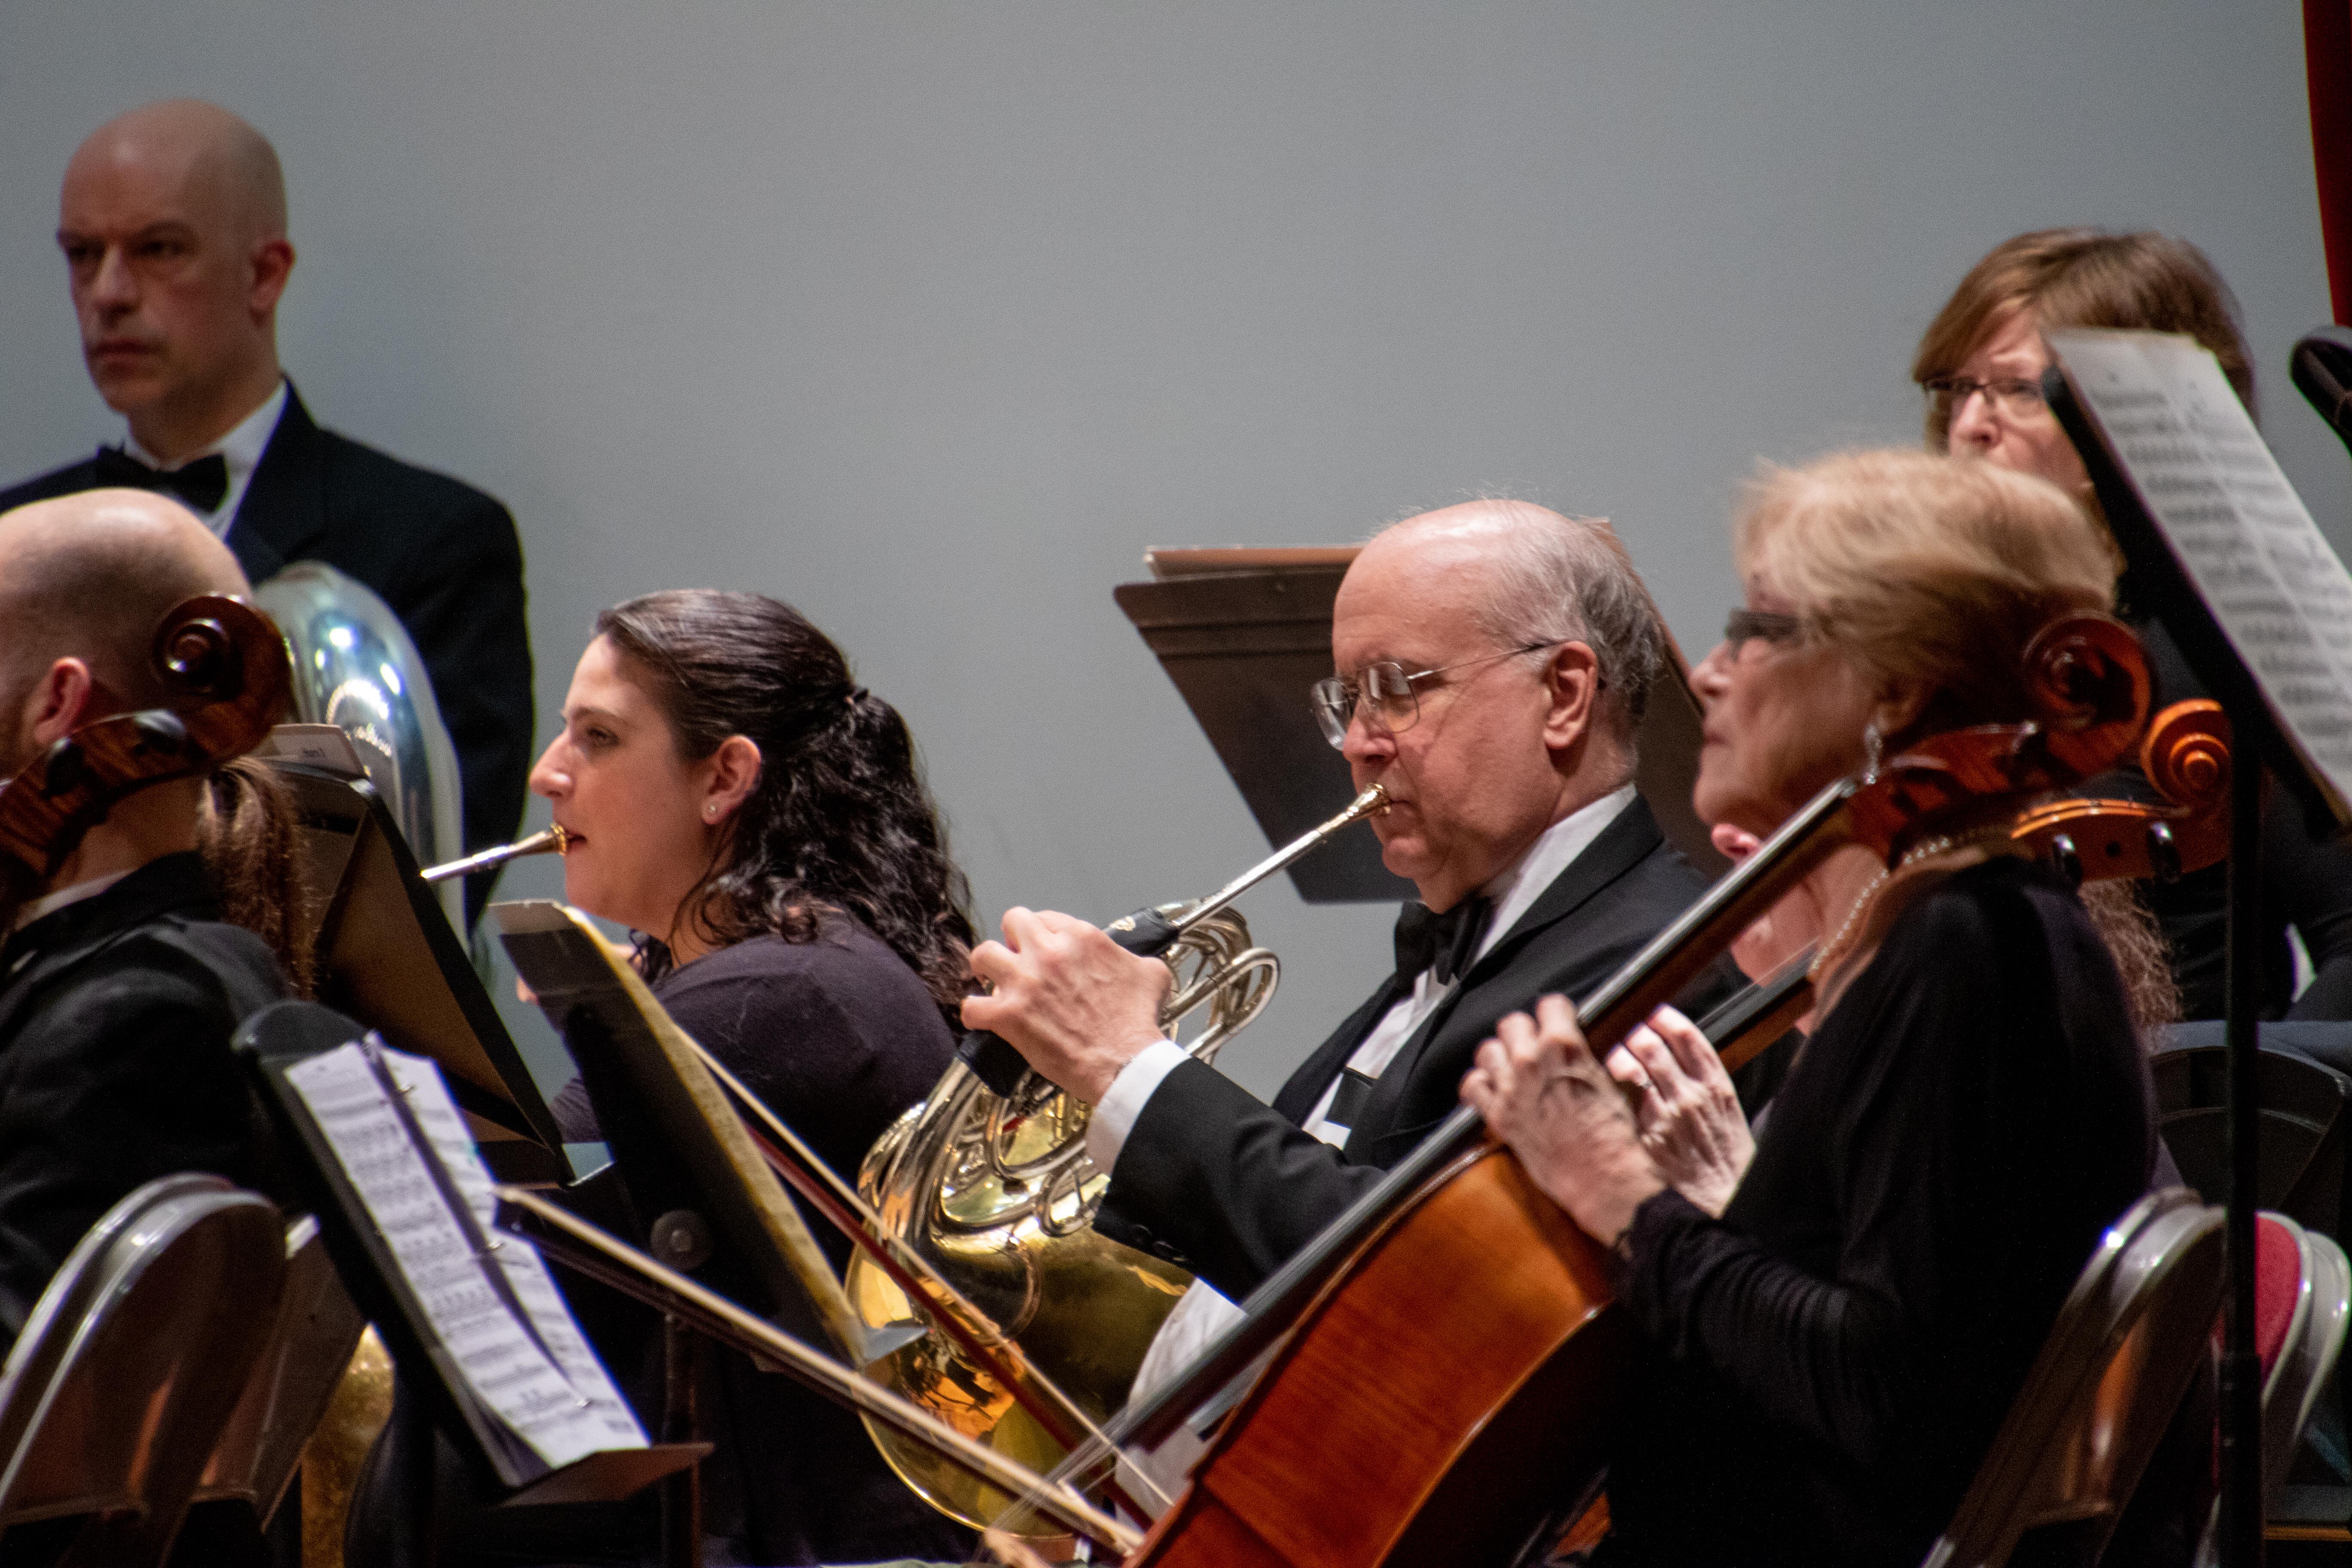 Catskill Symphony Orchestra 2019-2020 Concert Season